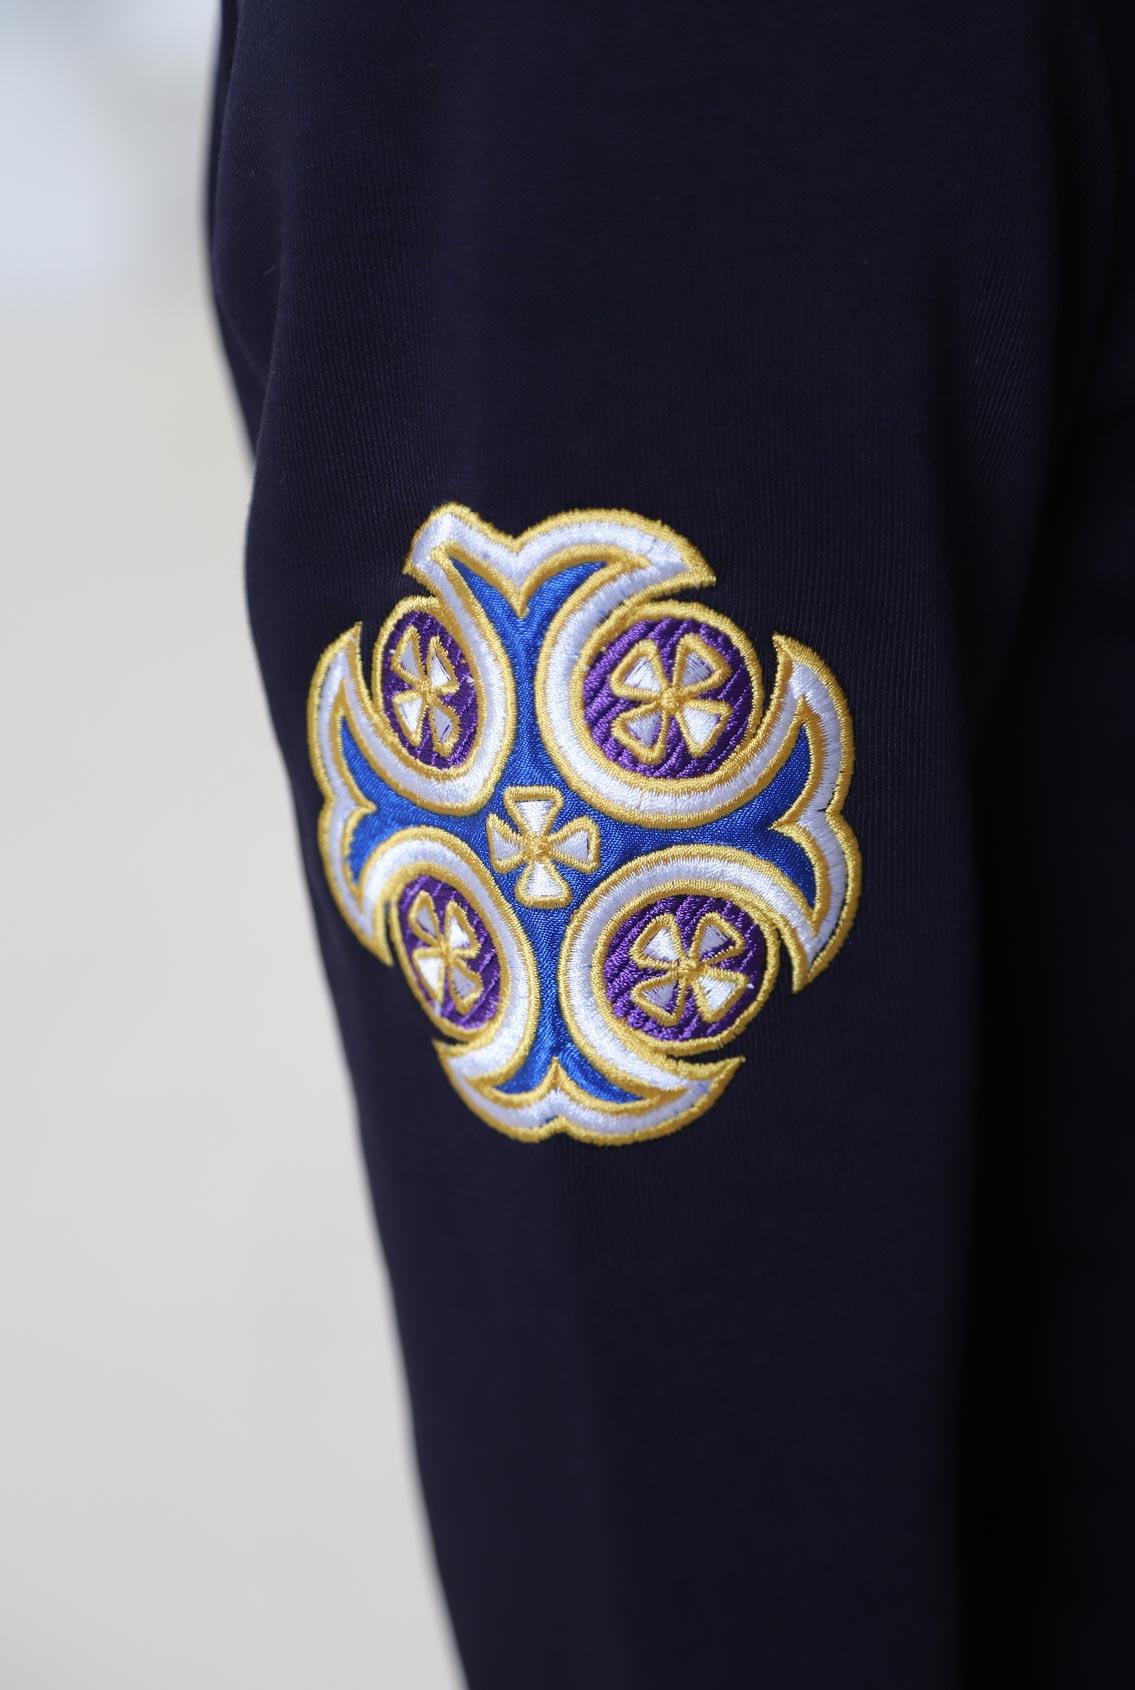 Толстовка с крестом, Sweatshirt with a cross